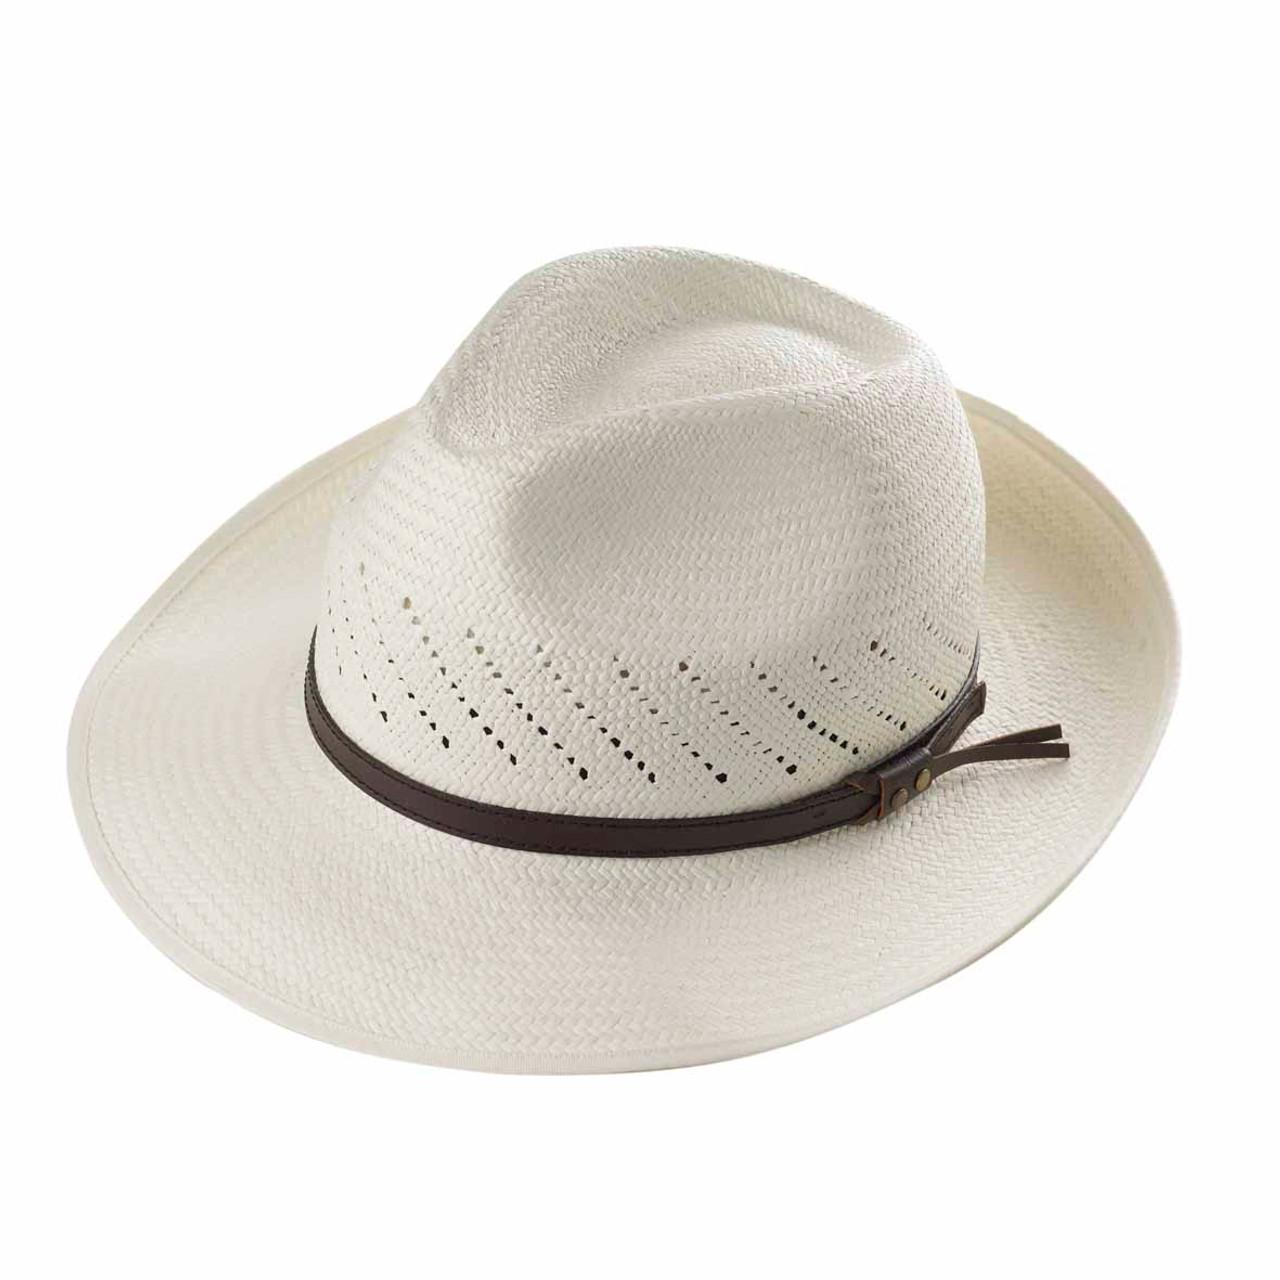 7e6a452f Open Vent Snap Trilby Panama - The Panama Hat Company